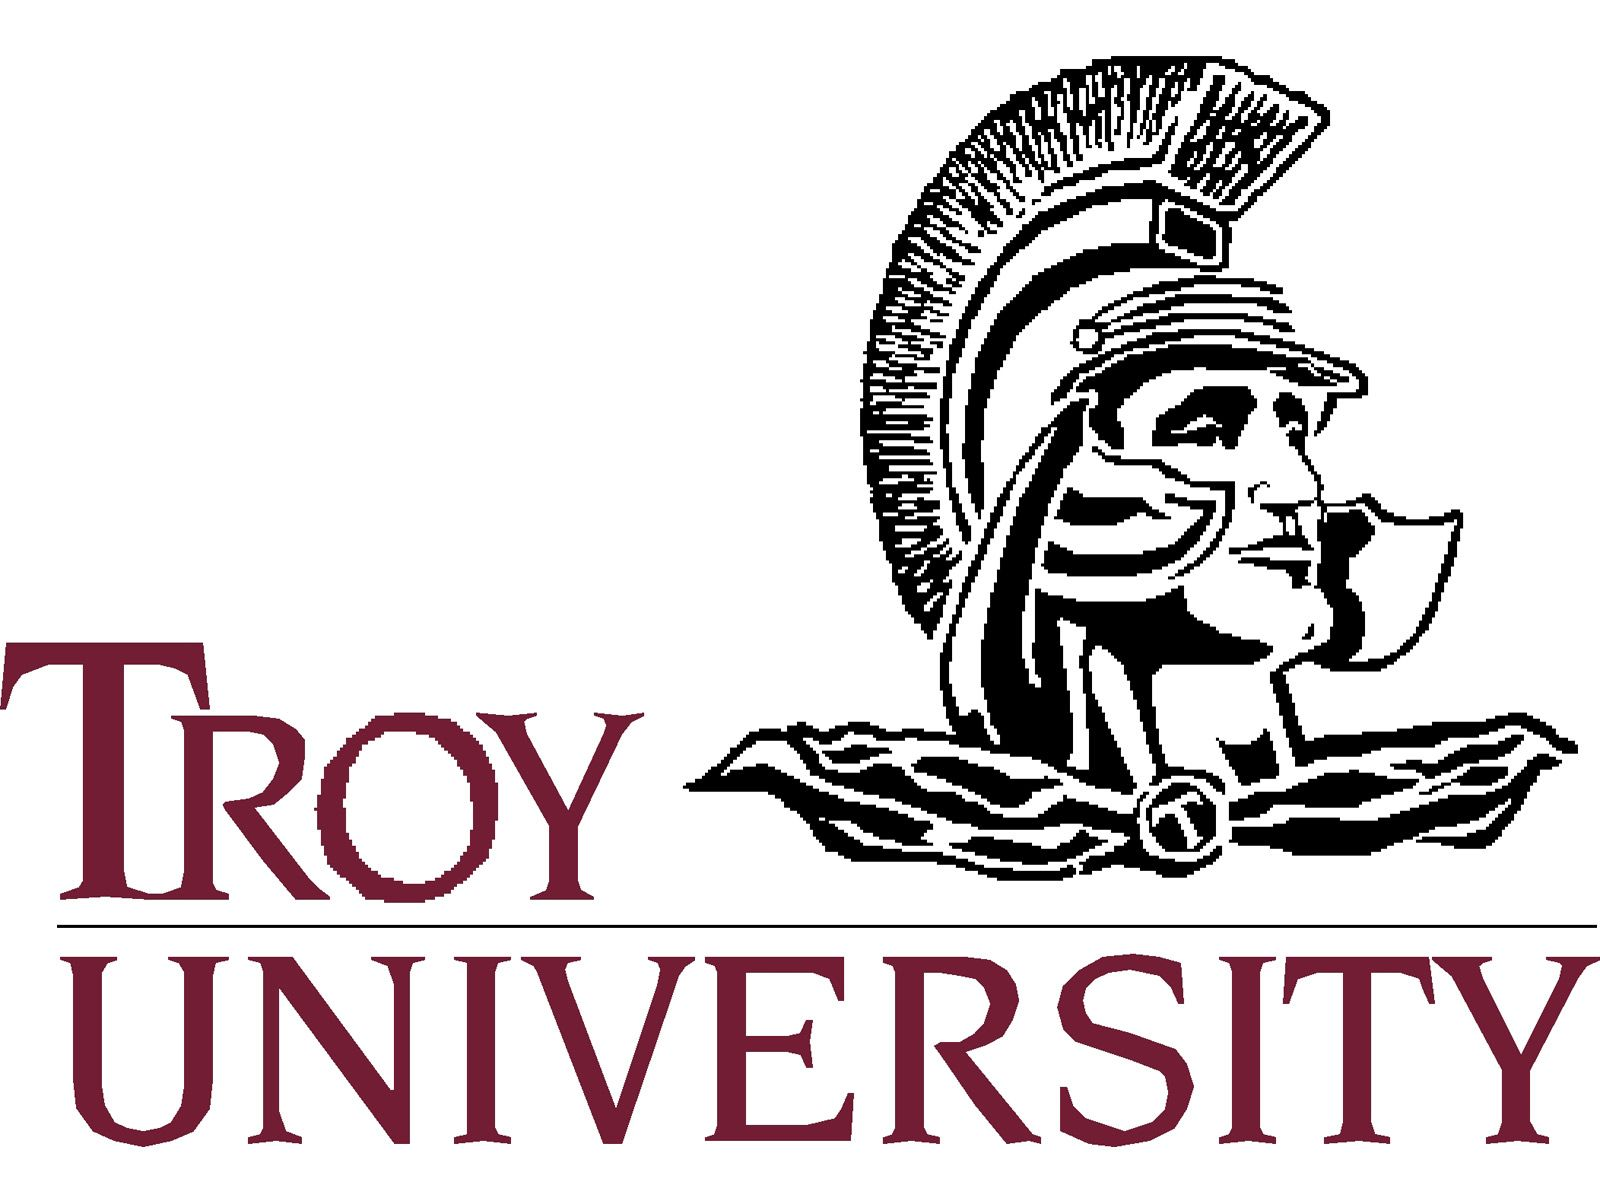 Free Troy University Football Computer Desktop Wallpaper Troy University Computer Wallpaper Desktop Wallpapers Troy